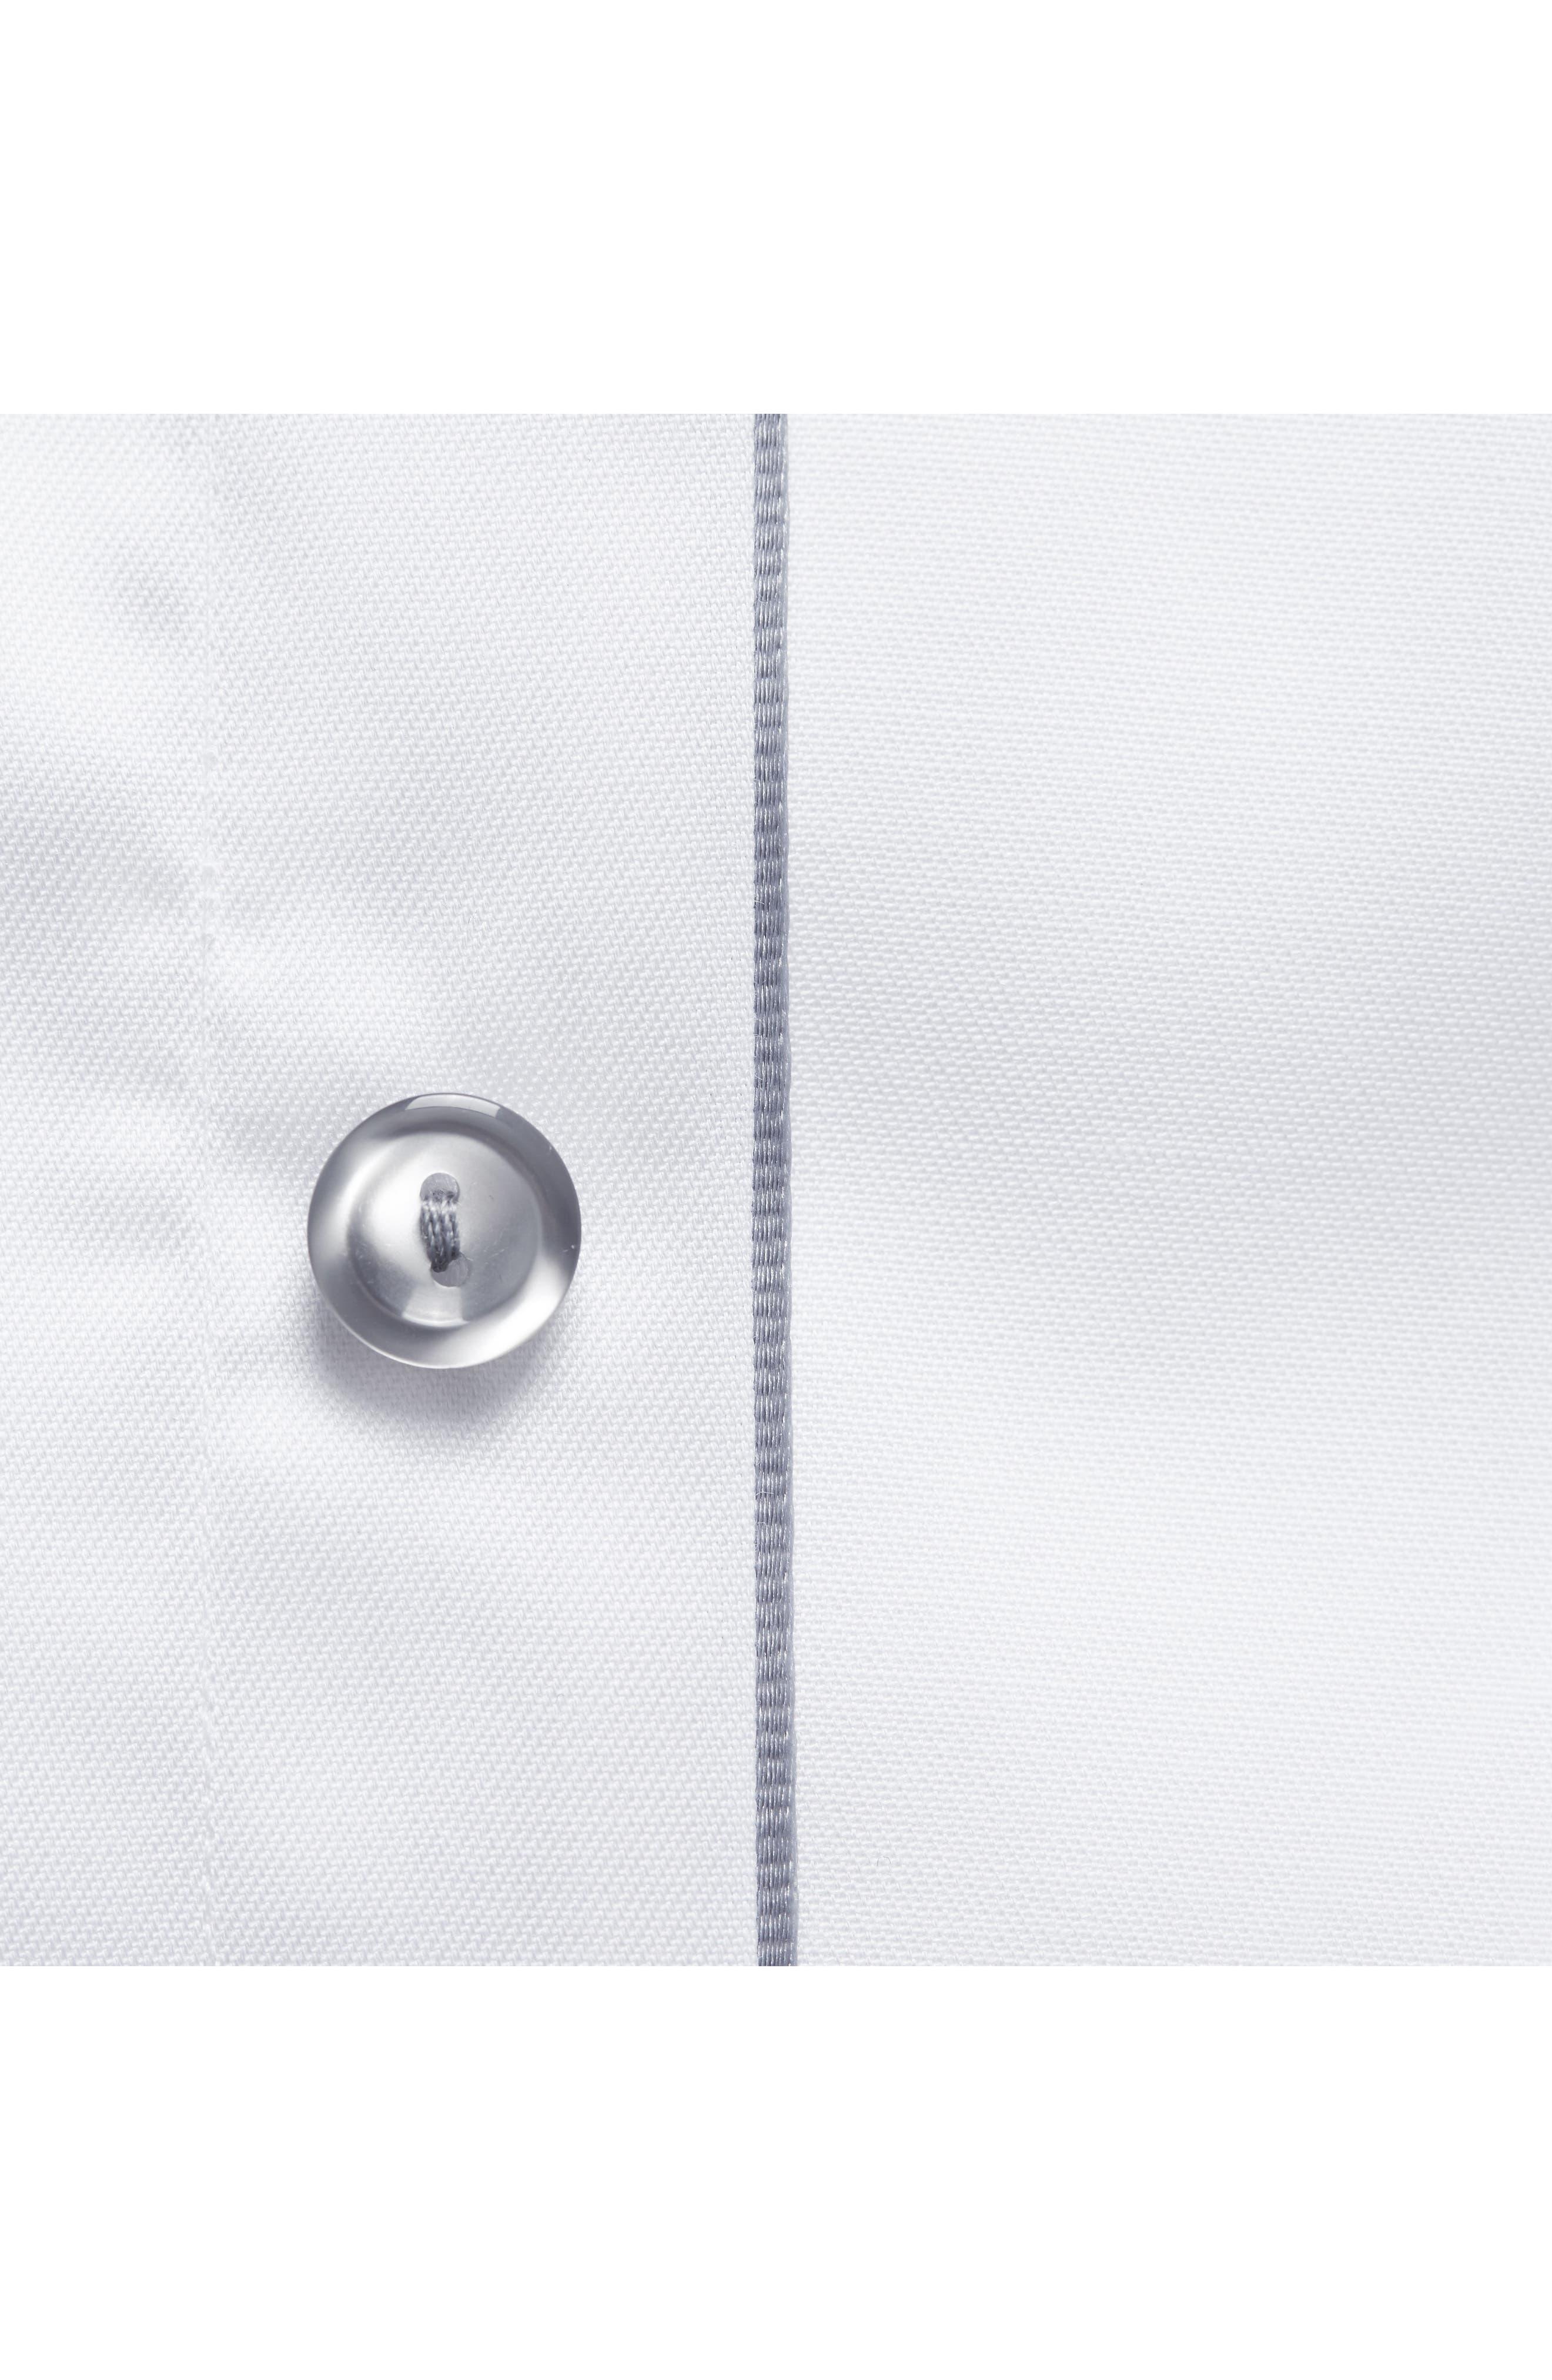 Alternate Image 4  - Eton Slim Fit Twill Dress Shirt with Grey Details